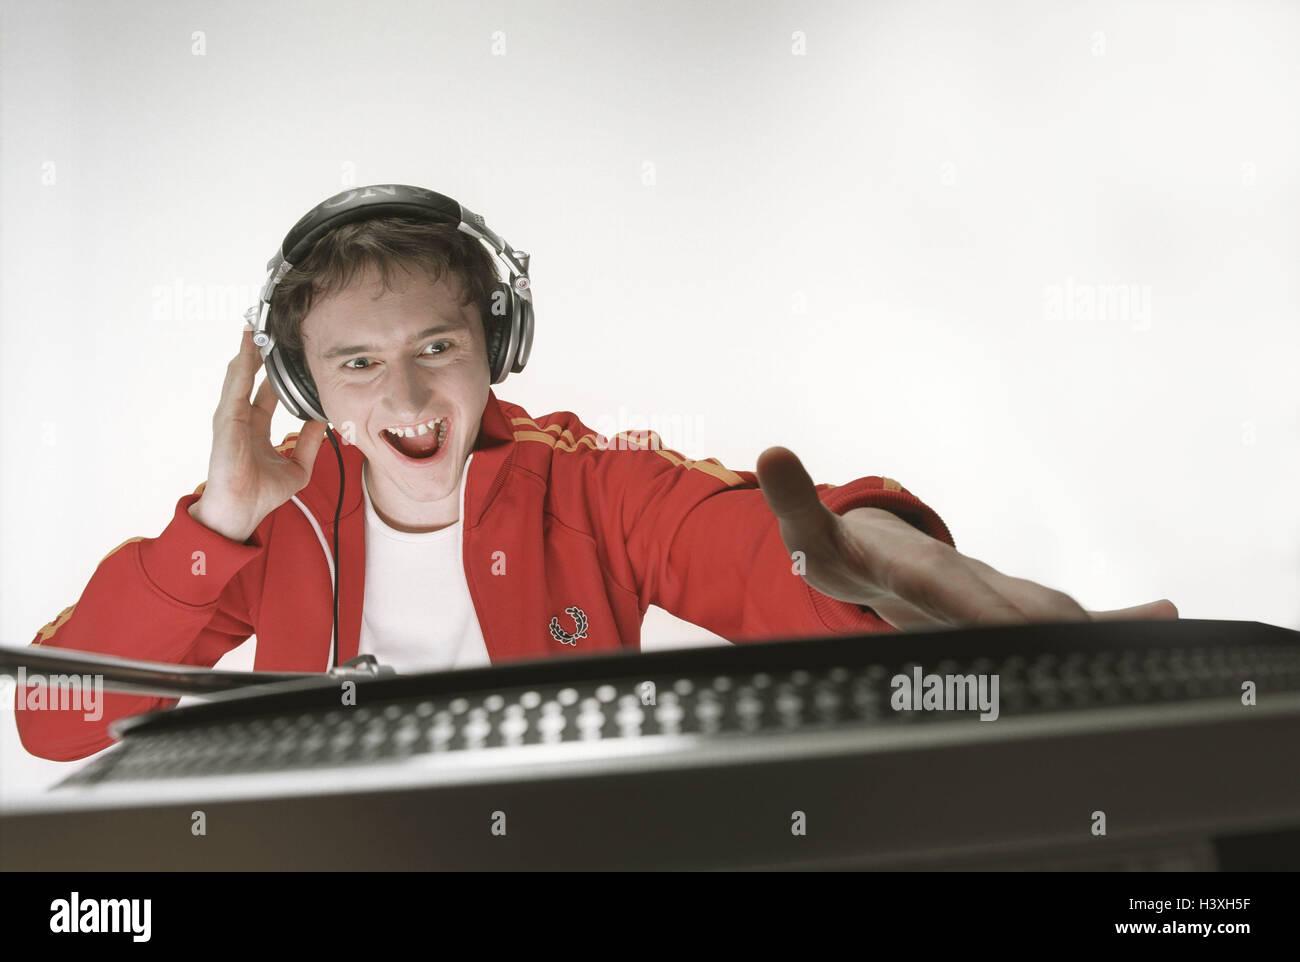 Man, young, headphones, music hears,  Plates, hangs up, portrait,   Series, 20-30 years, 25 years, single, DJ, training - Stock Image